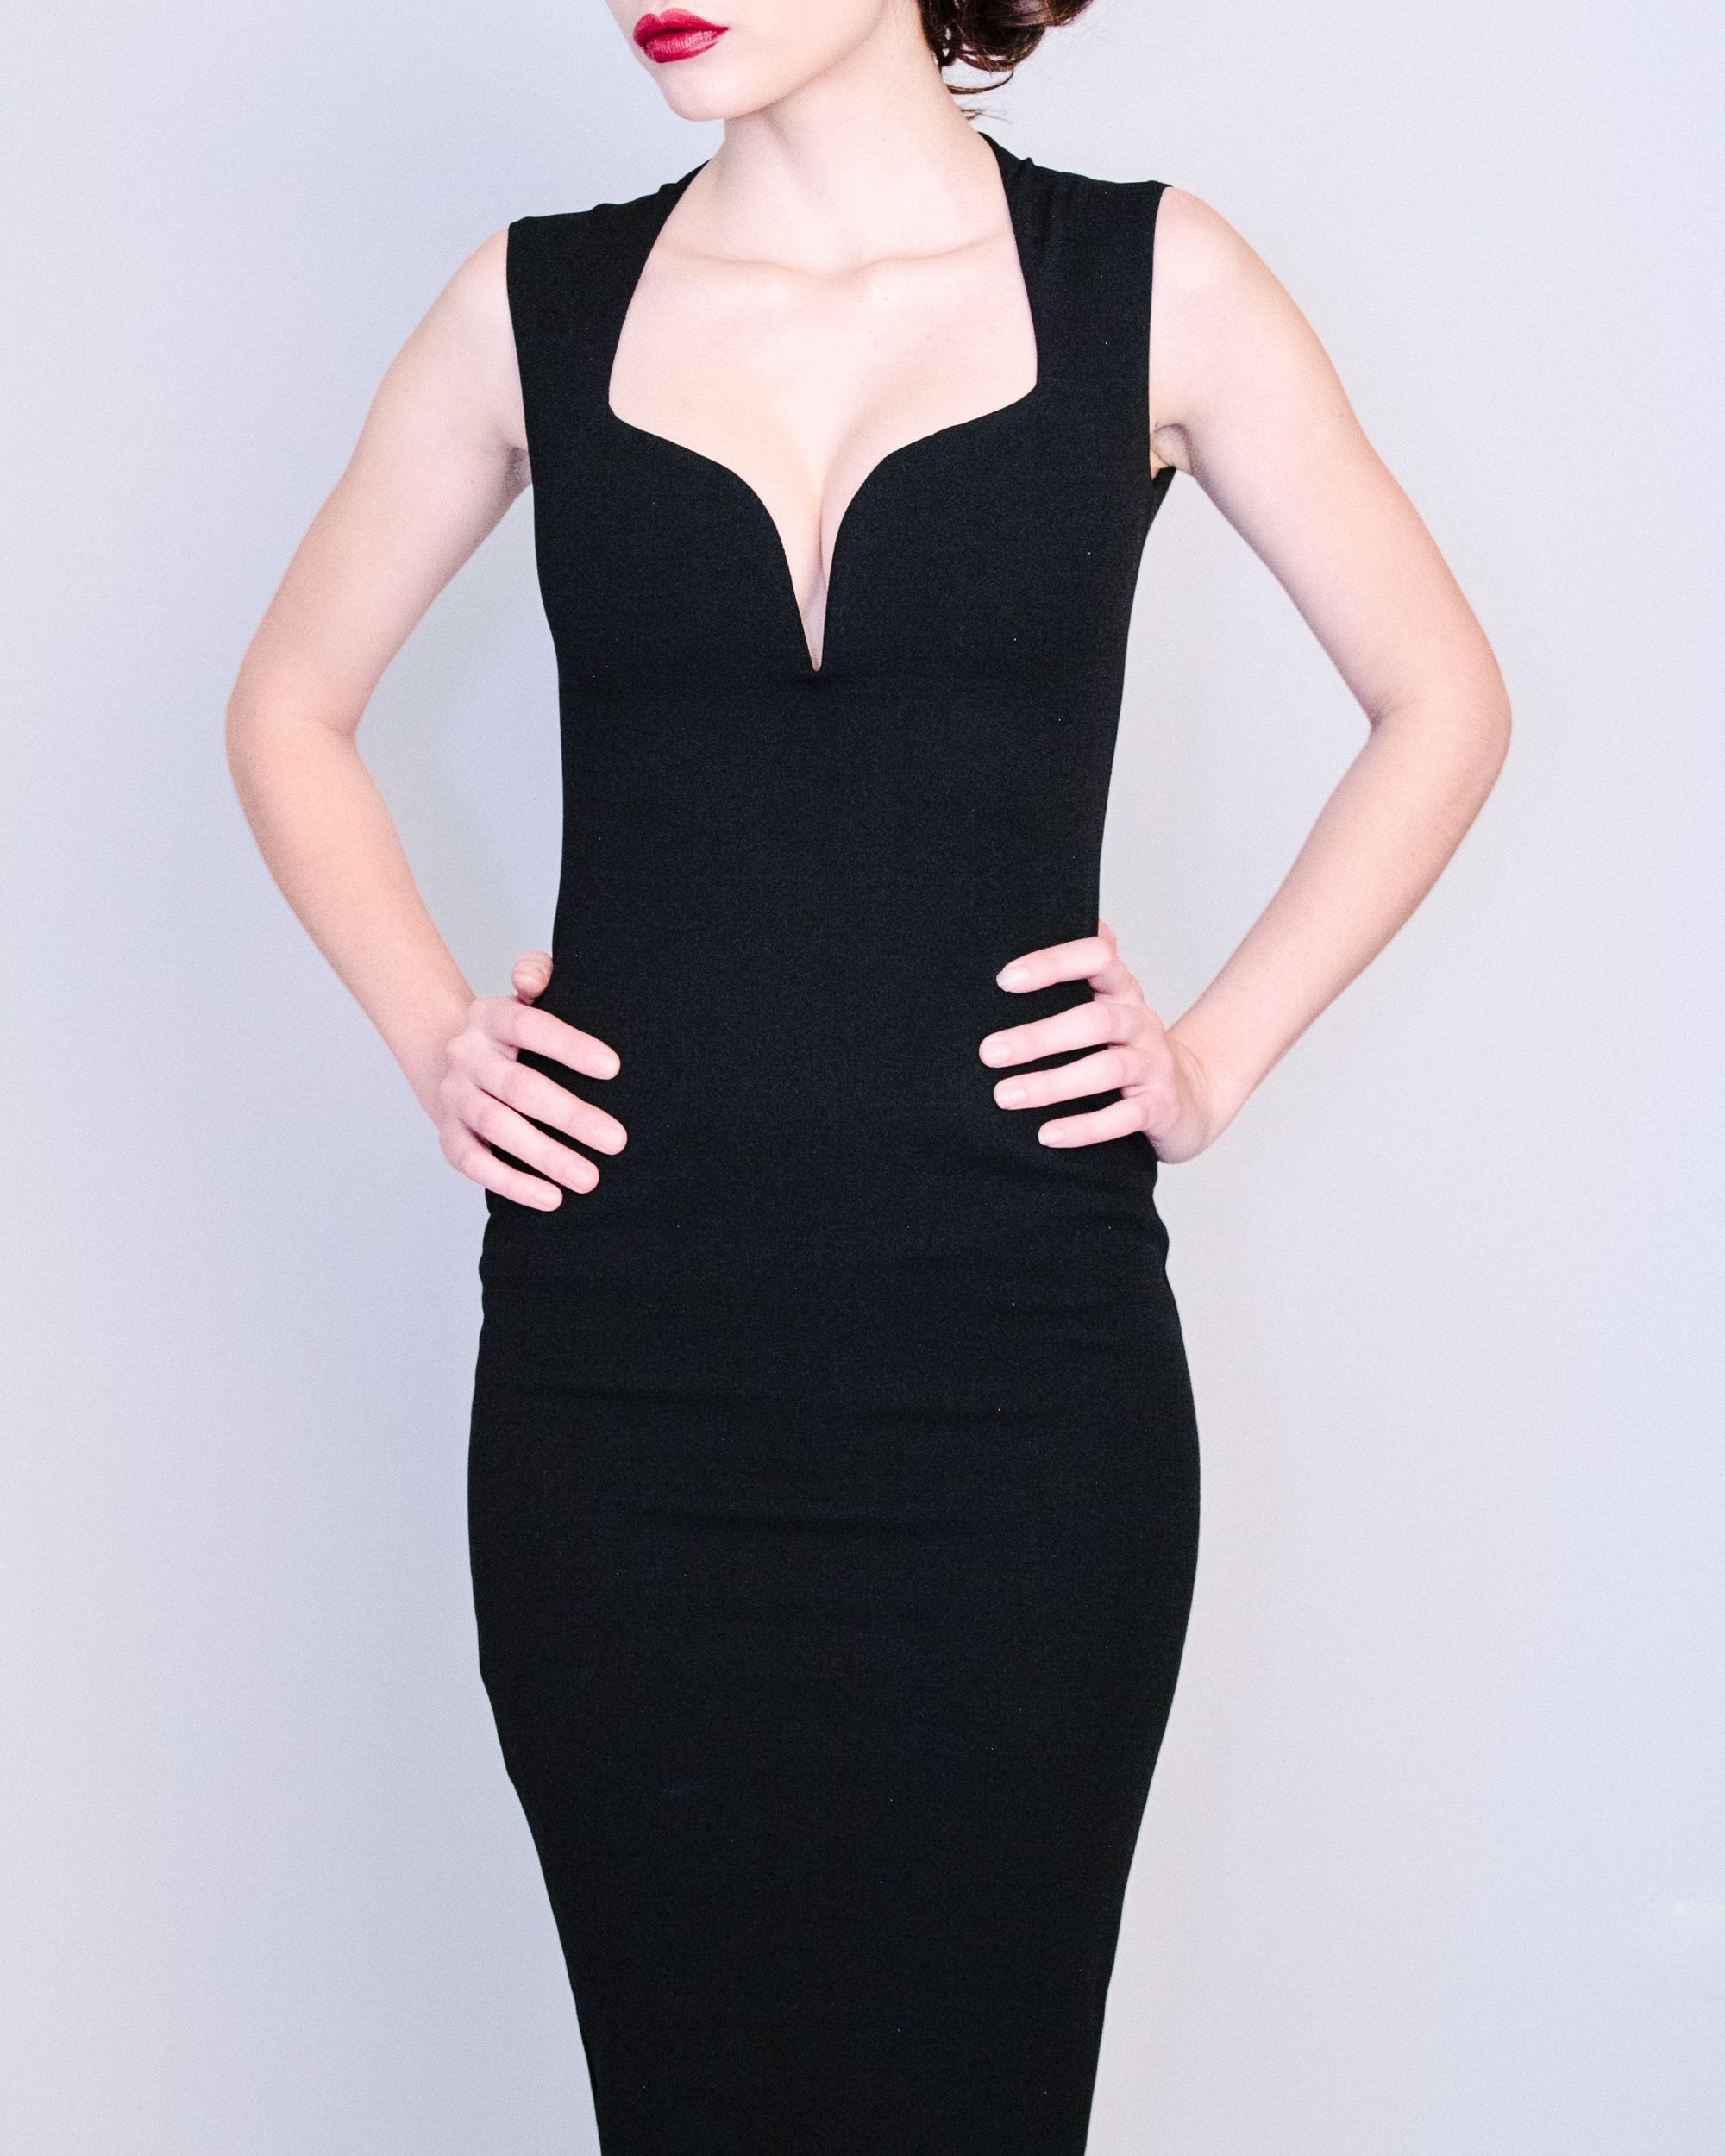 Best Meghan Markle Dresses 2019